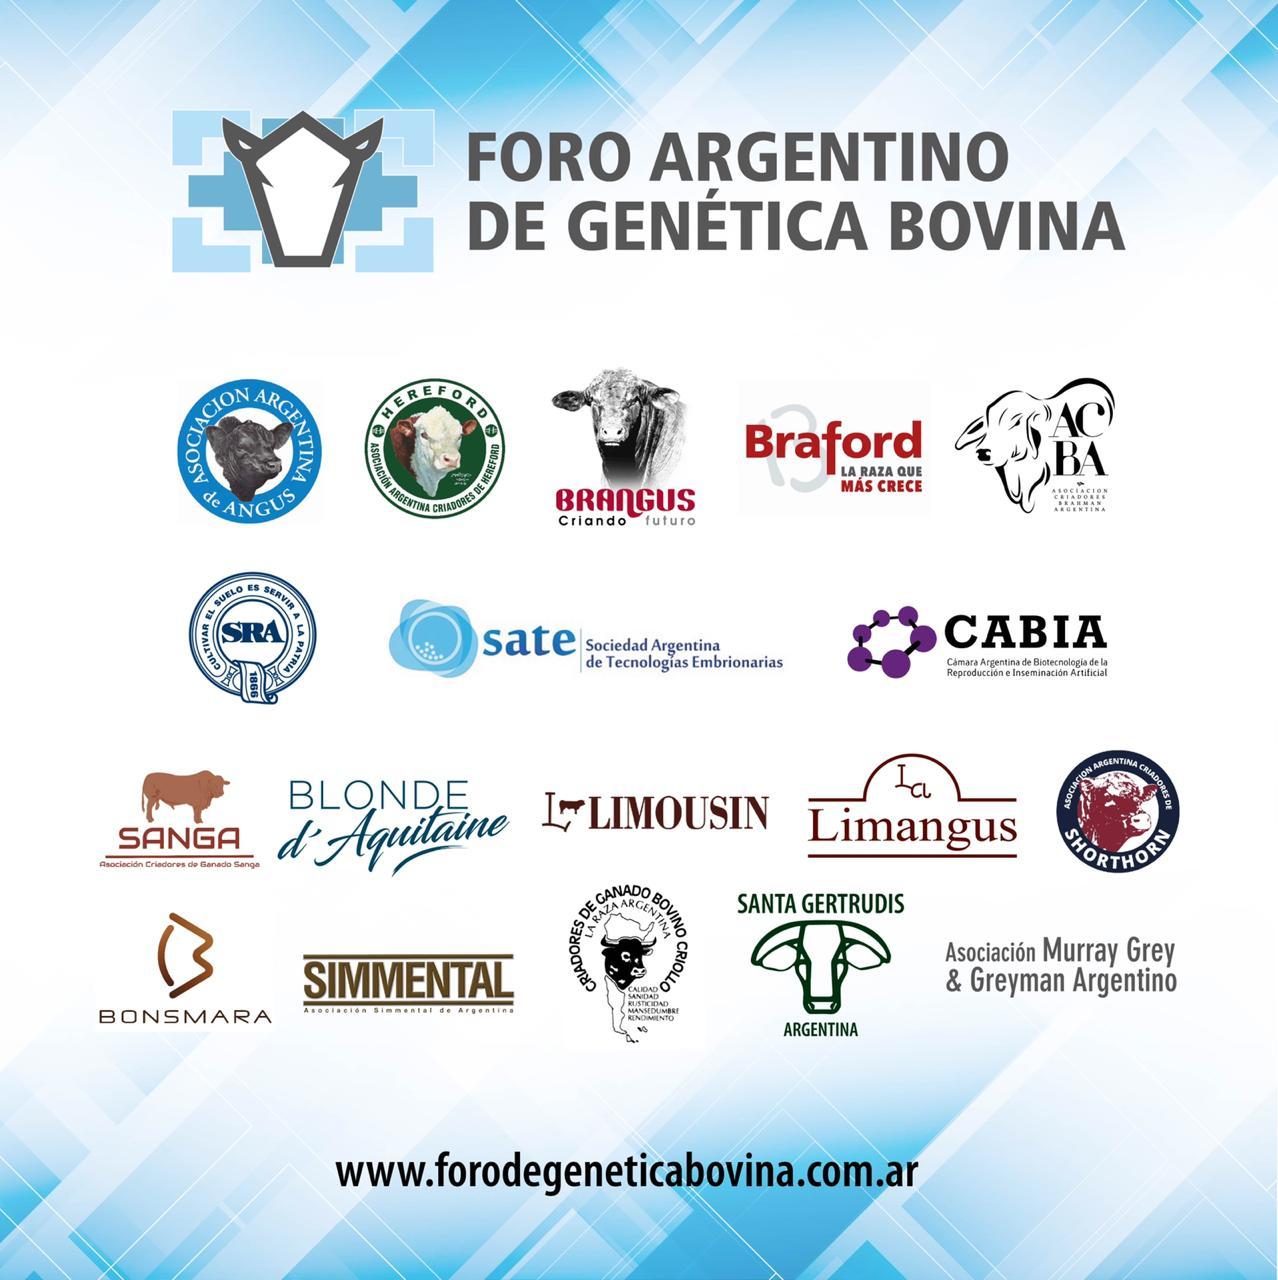 Foro Argentino de Genética Bovina